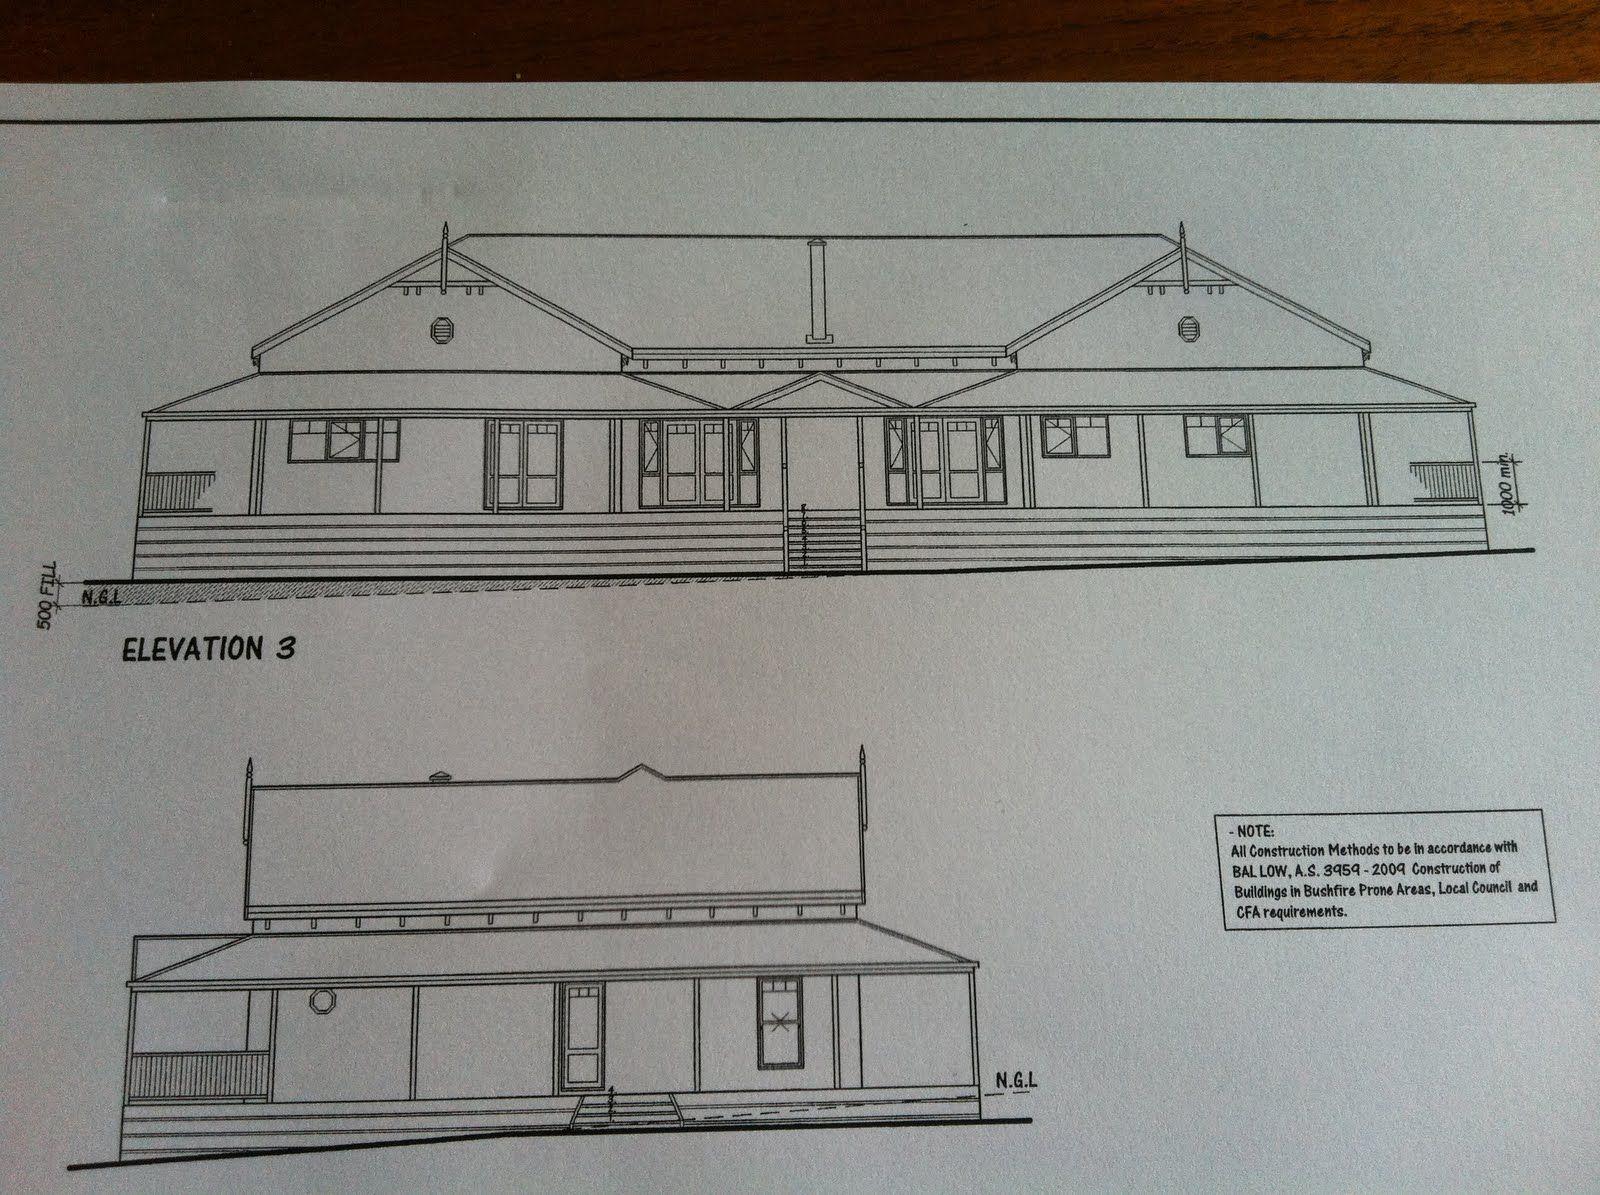 White Verandah House Plans House Plans How To Plan House Elevation